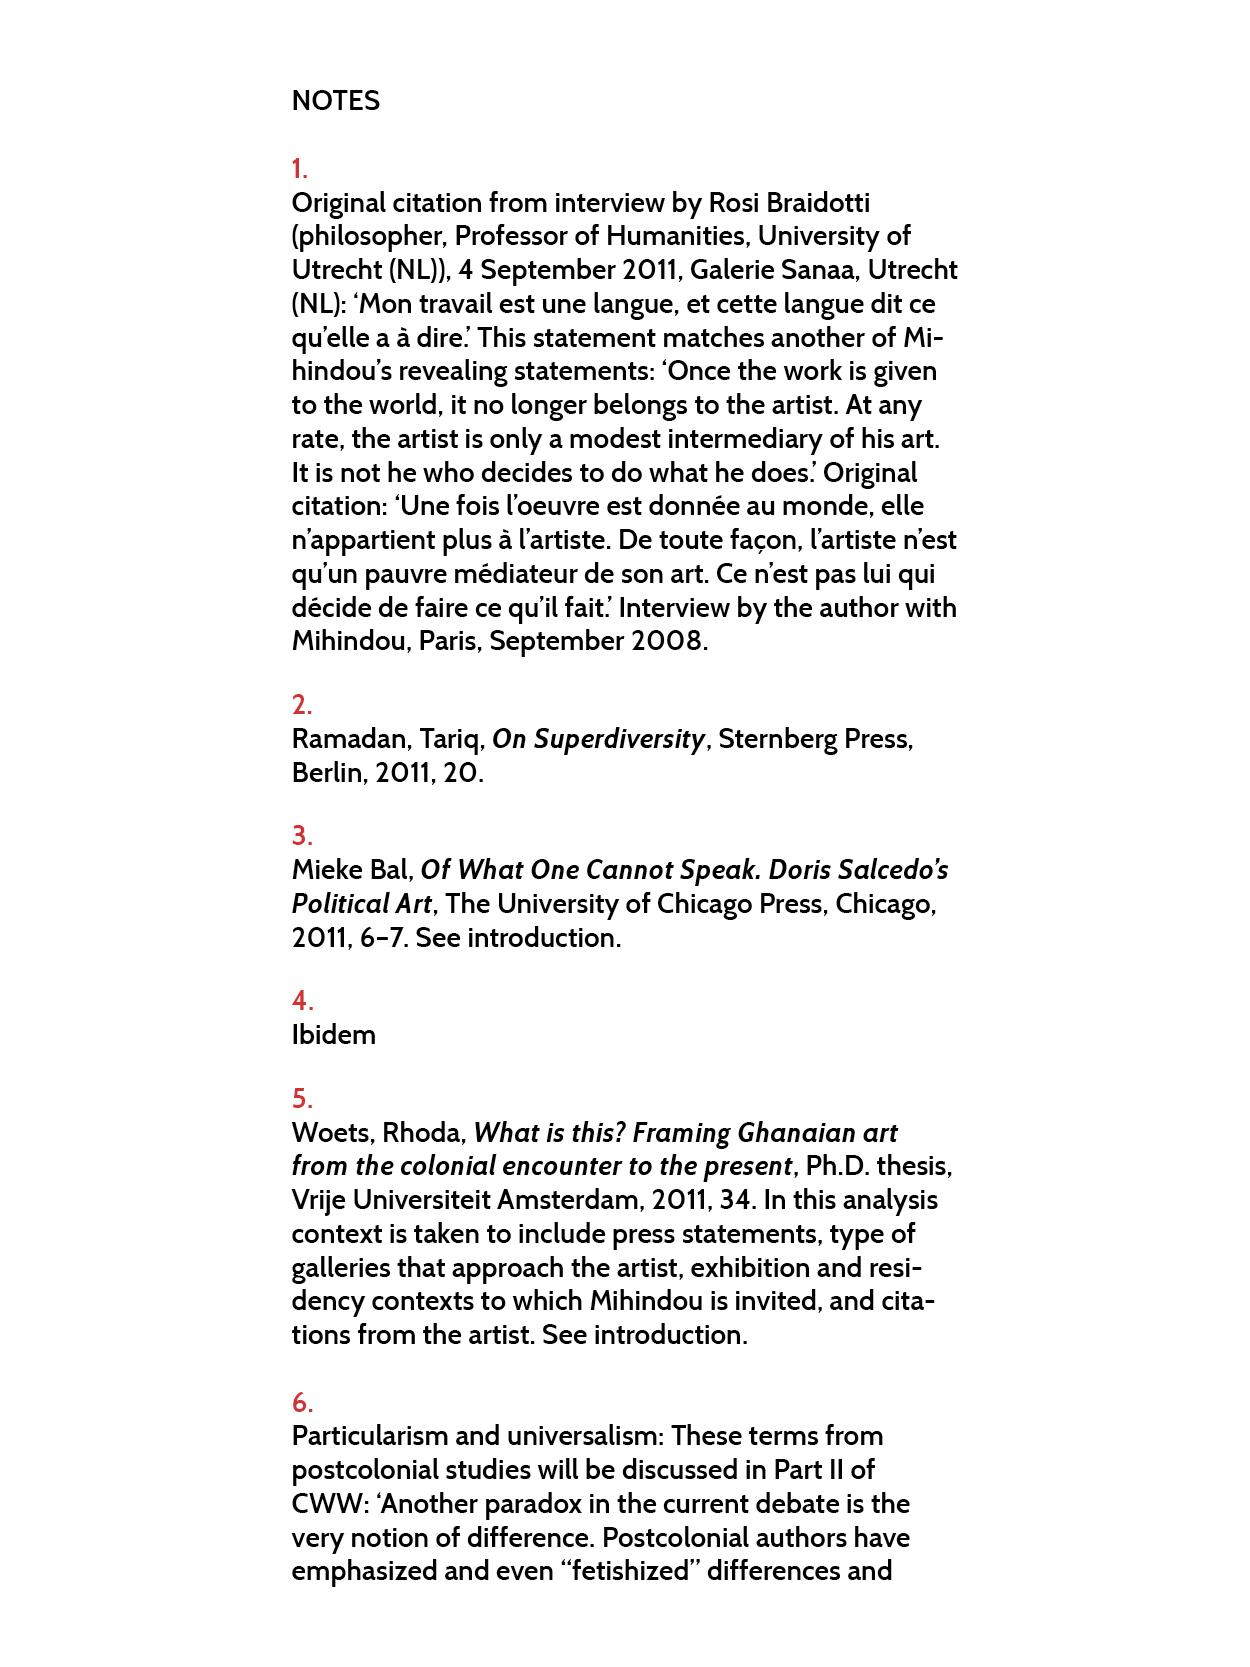 Essay writing contests 2013